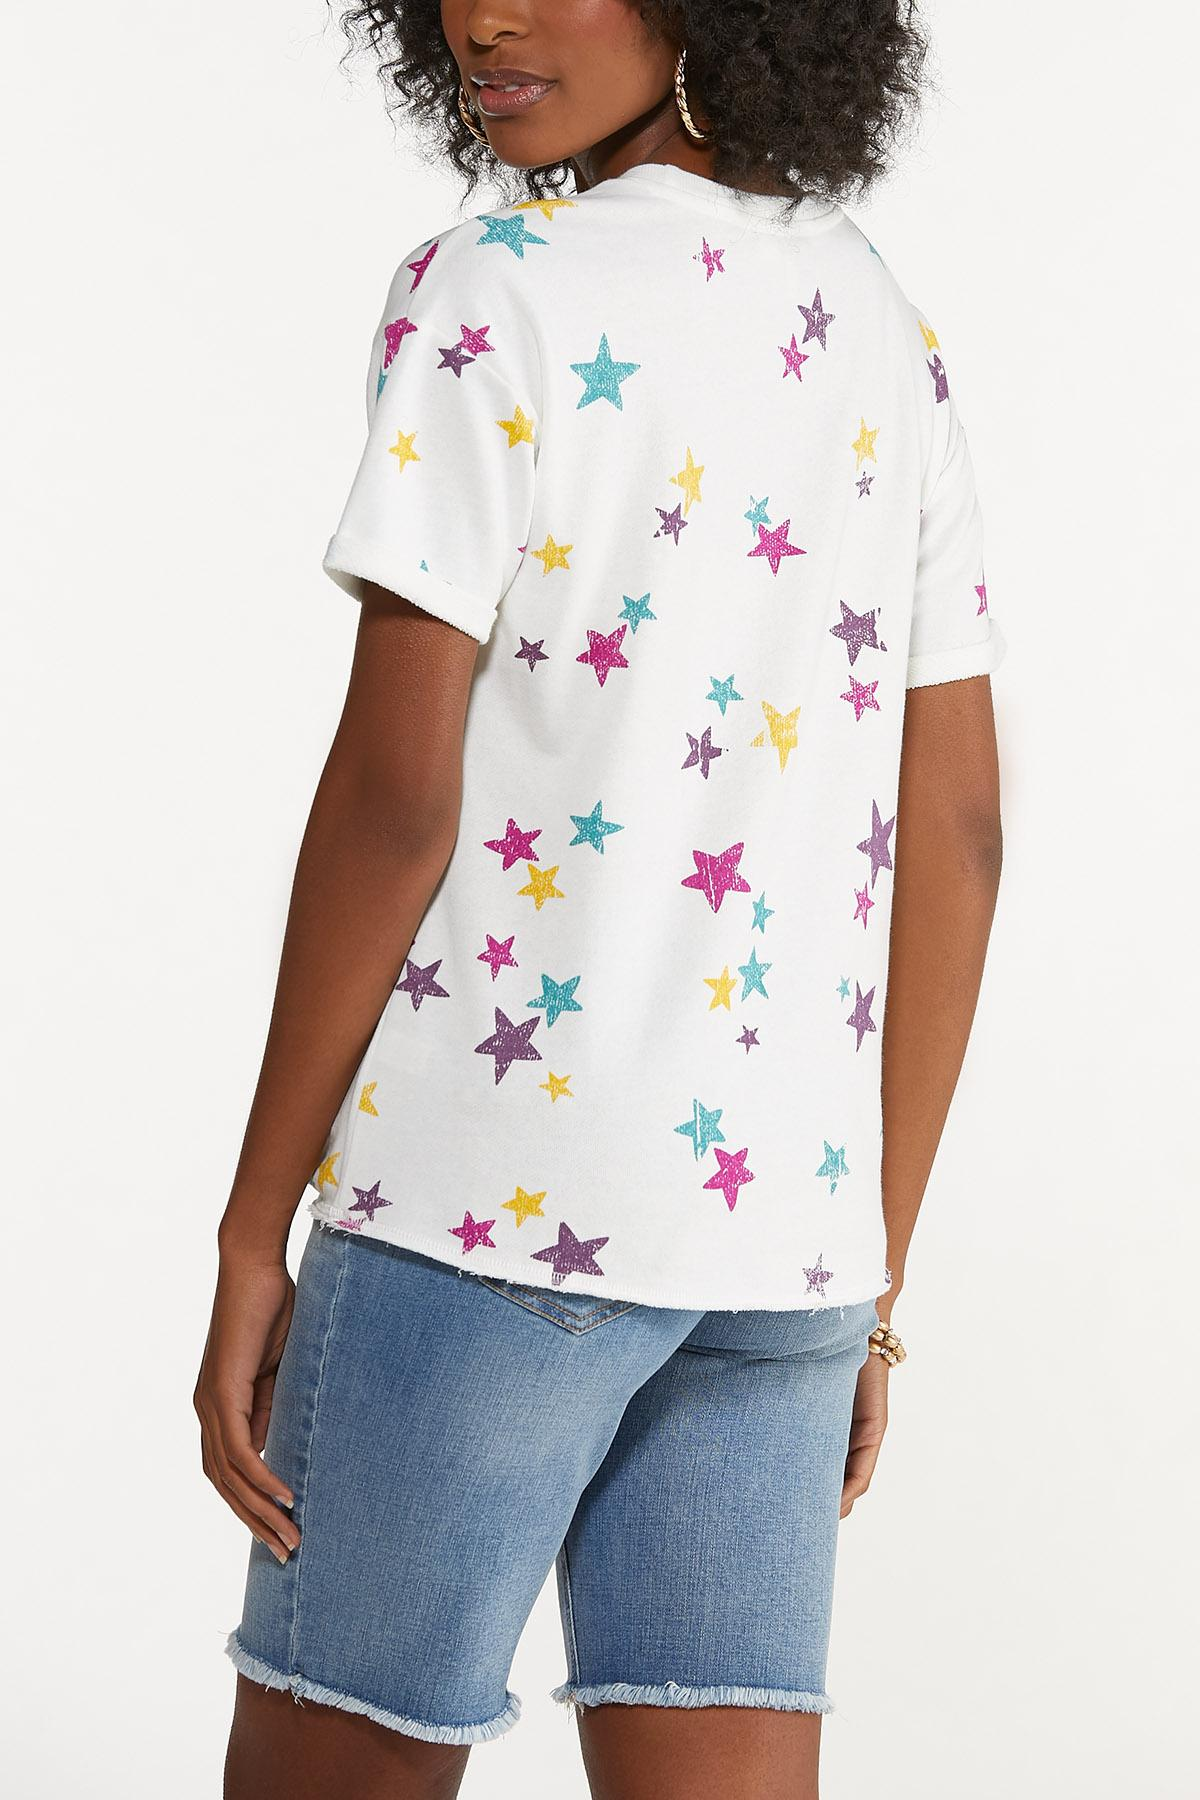 Plus Size Knotted Star Sweatshirt (Item #44680970)